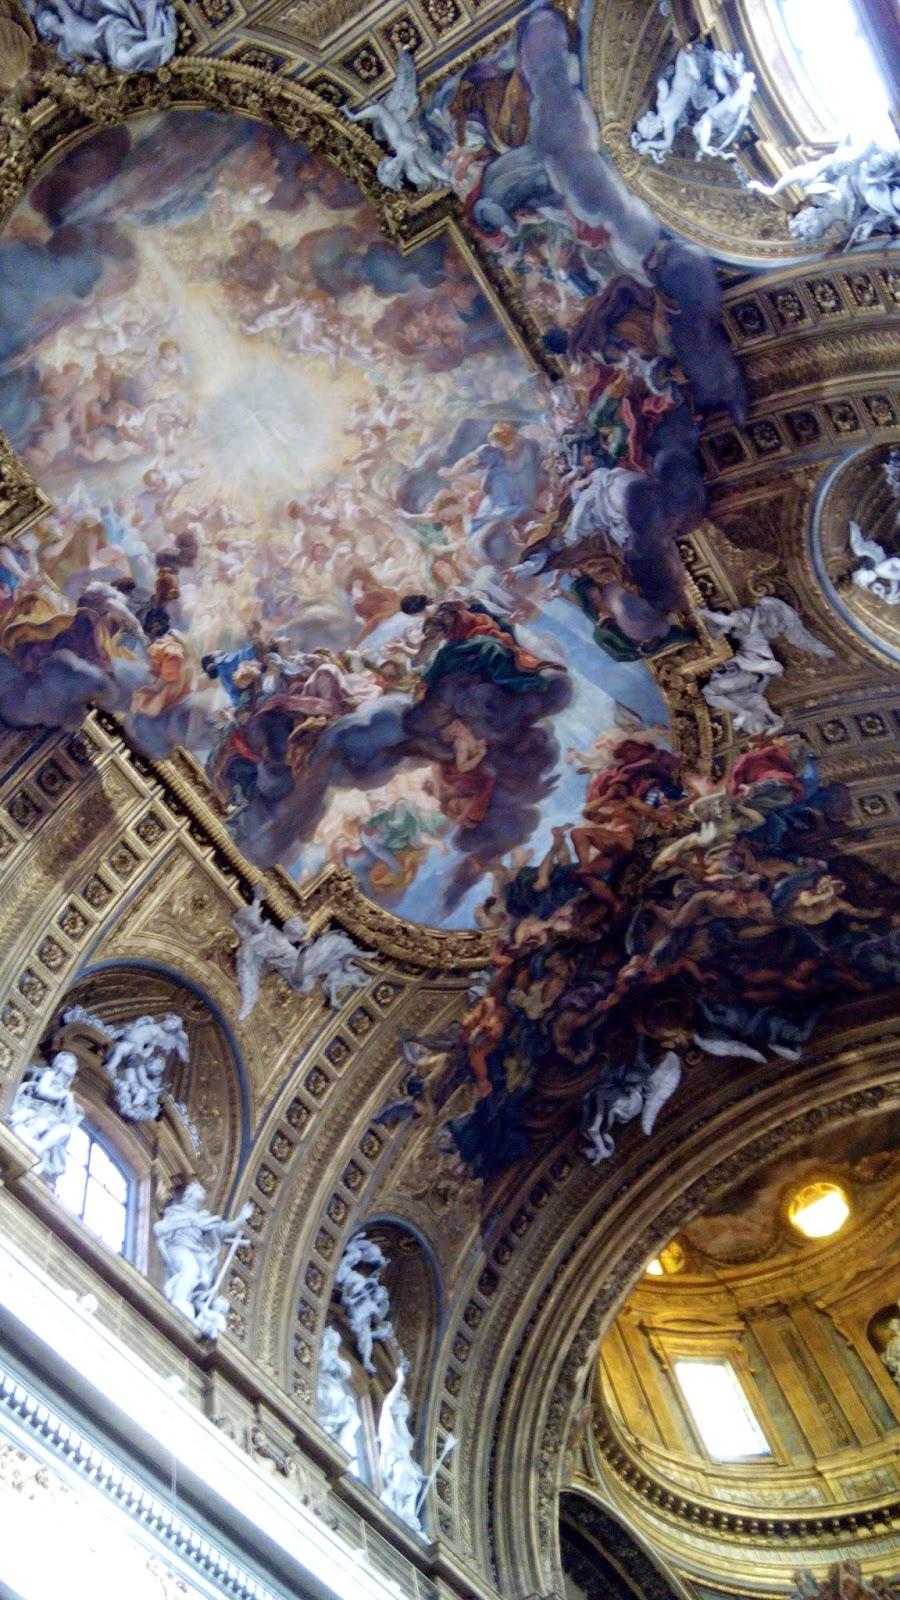 guiaderoma chiesa del gesu baccicia det - Igreja de Jesus